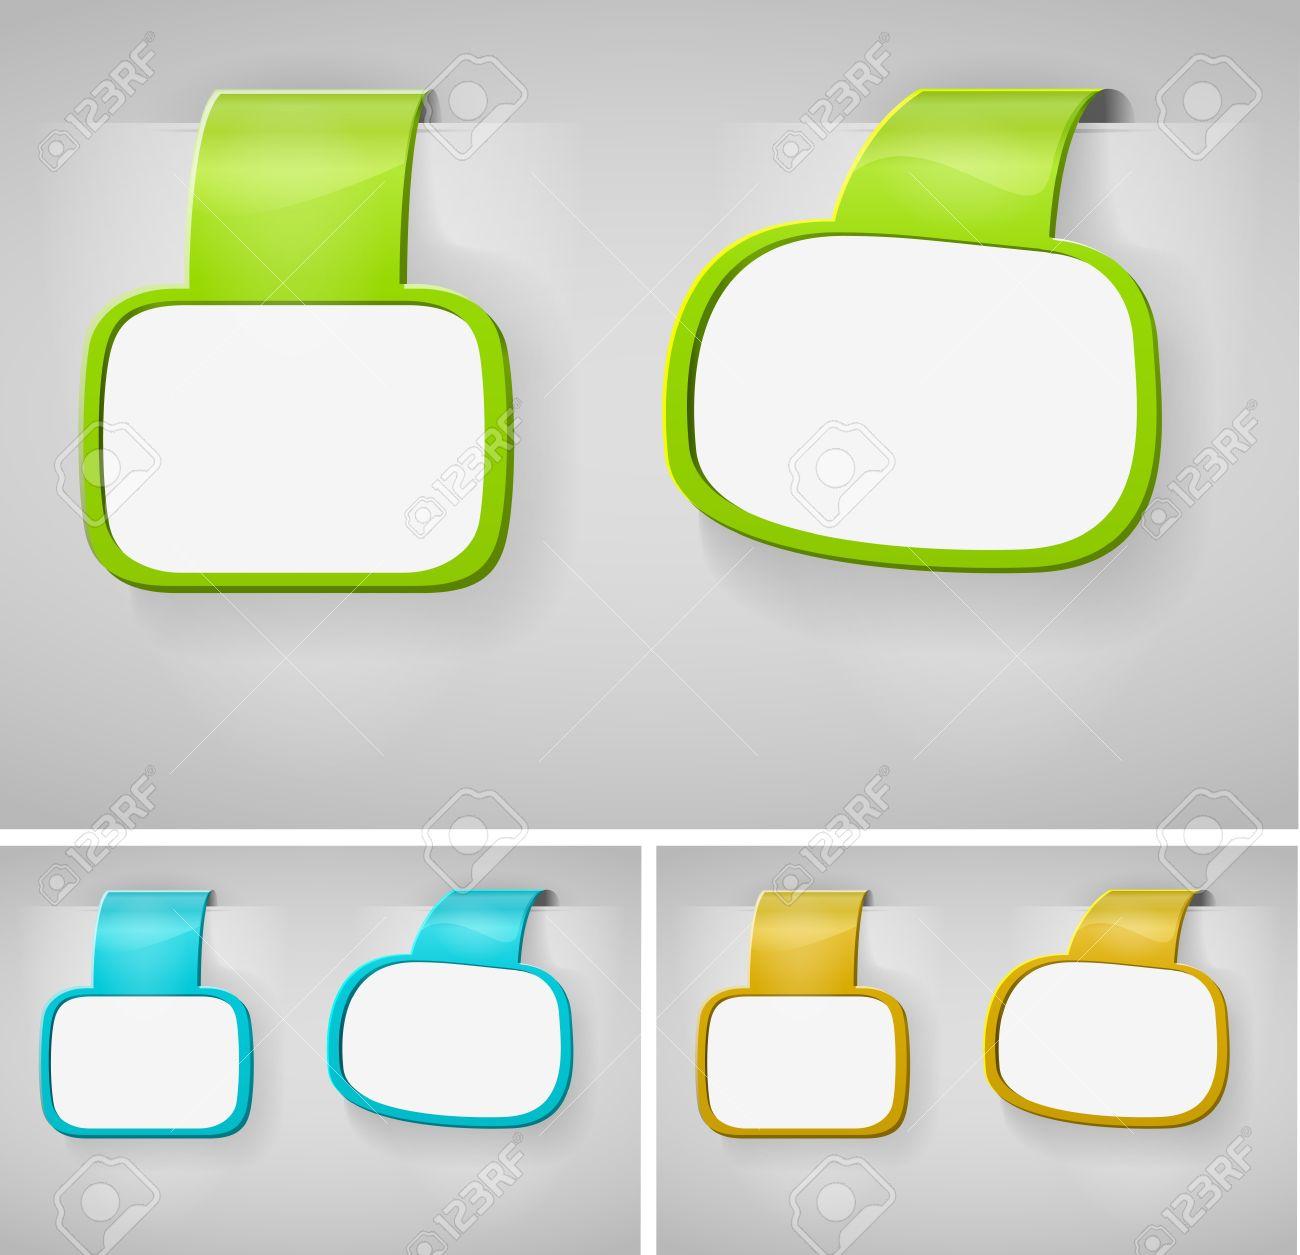 Color Blank Banner Display Template Set For Design Work  - Vector Illustration Stock Vector - 12201913